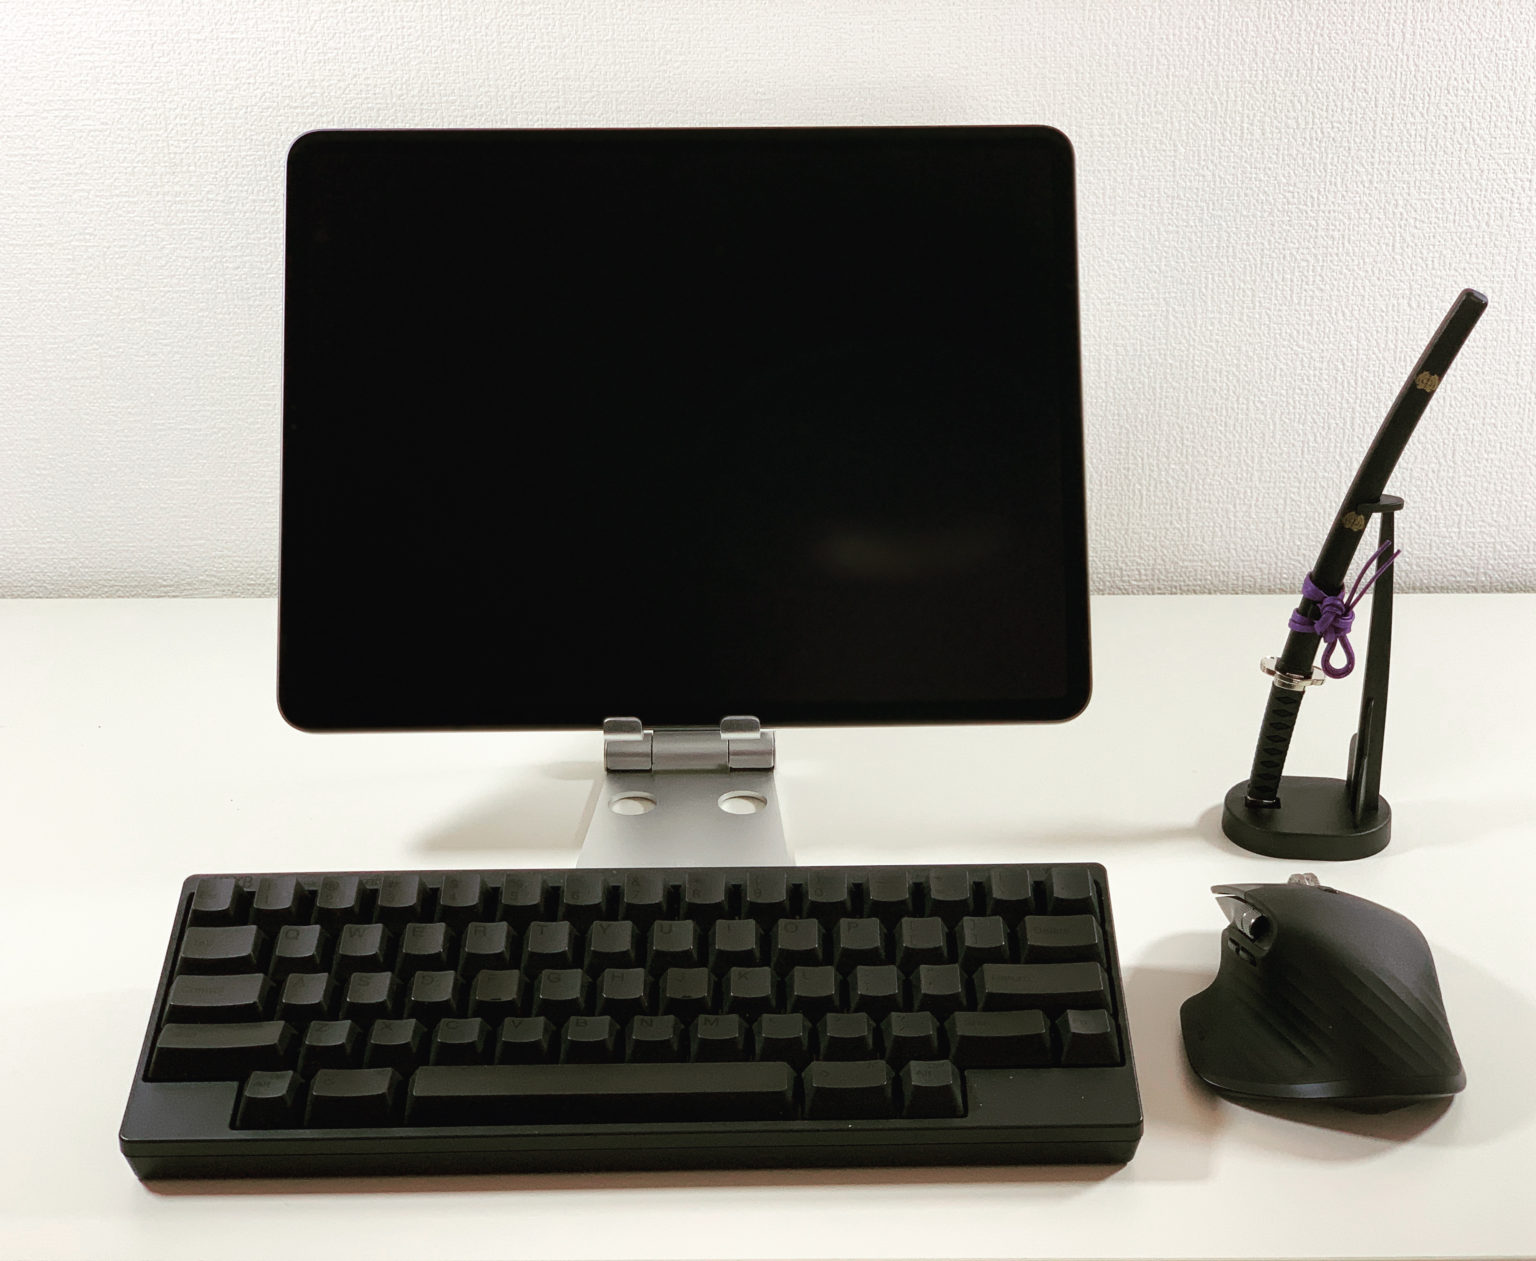 ipad pro desktop